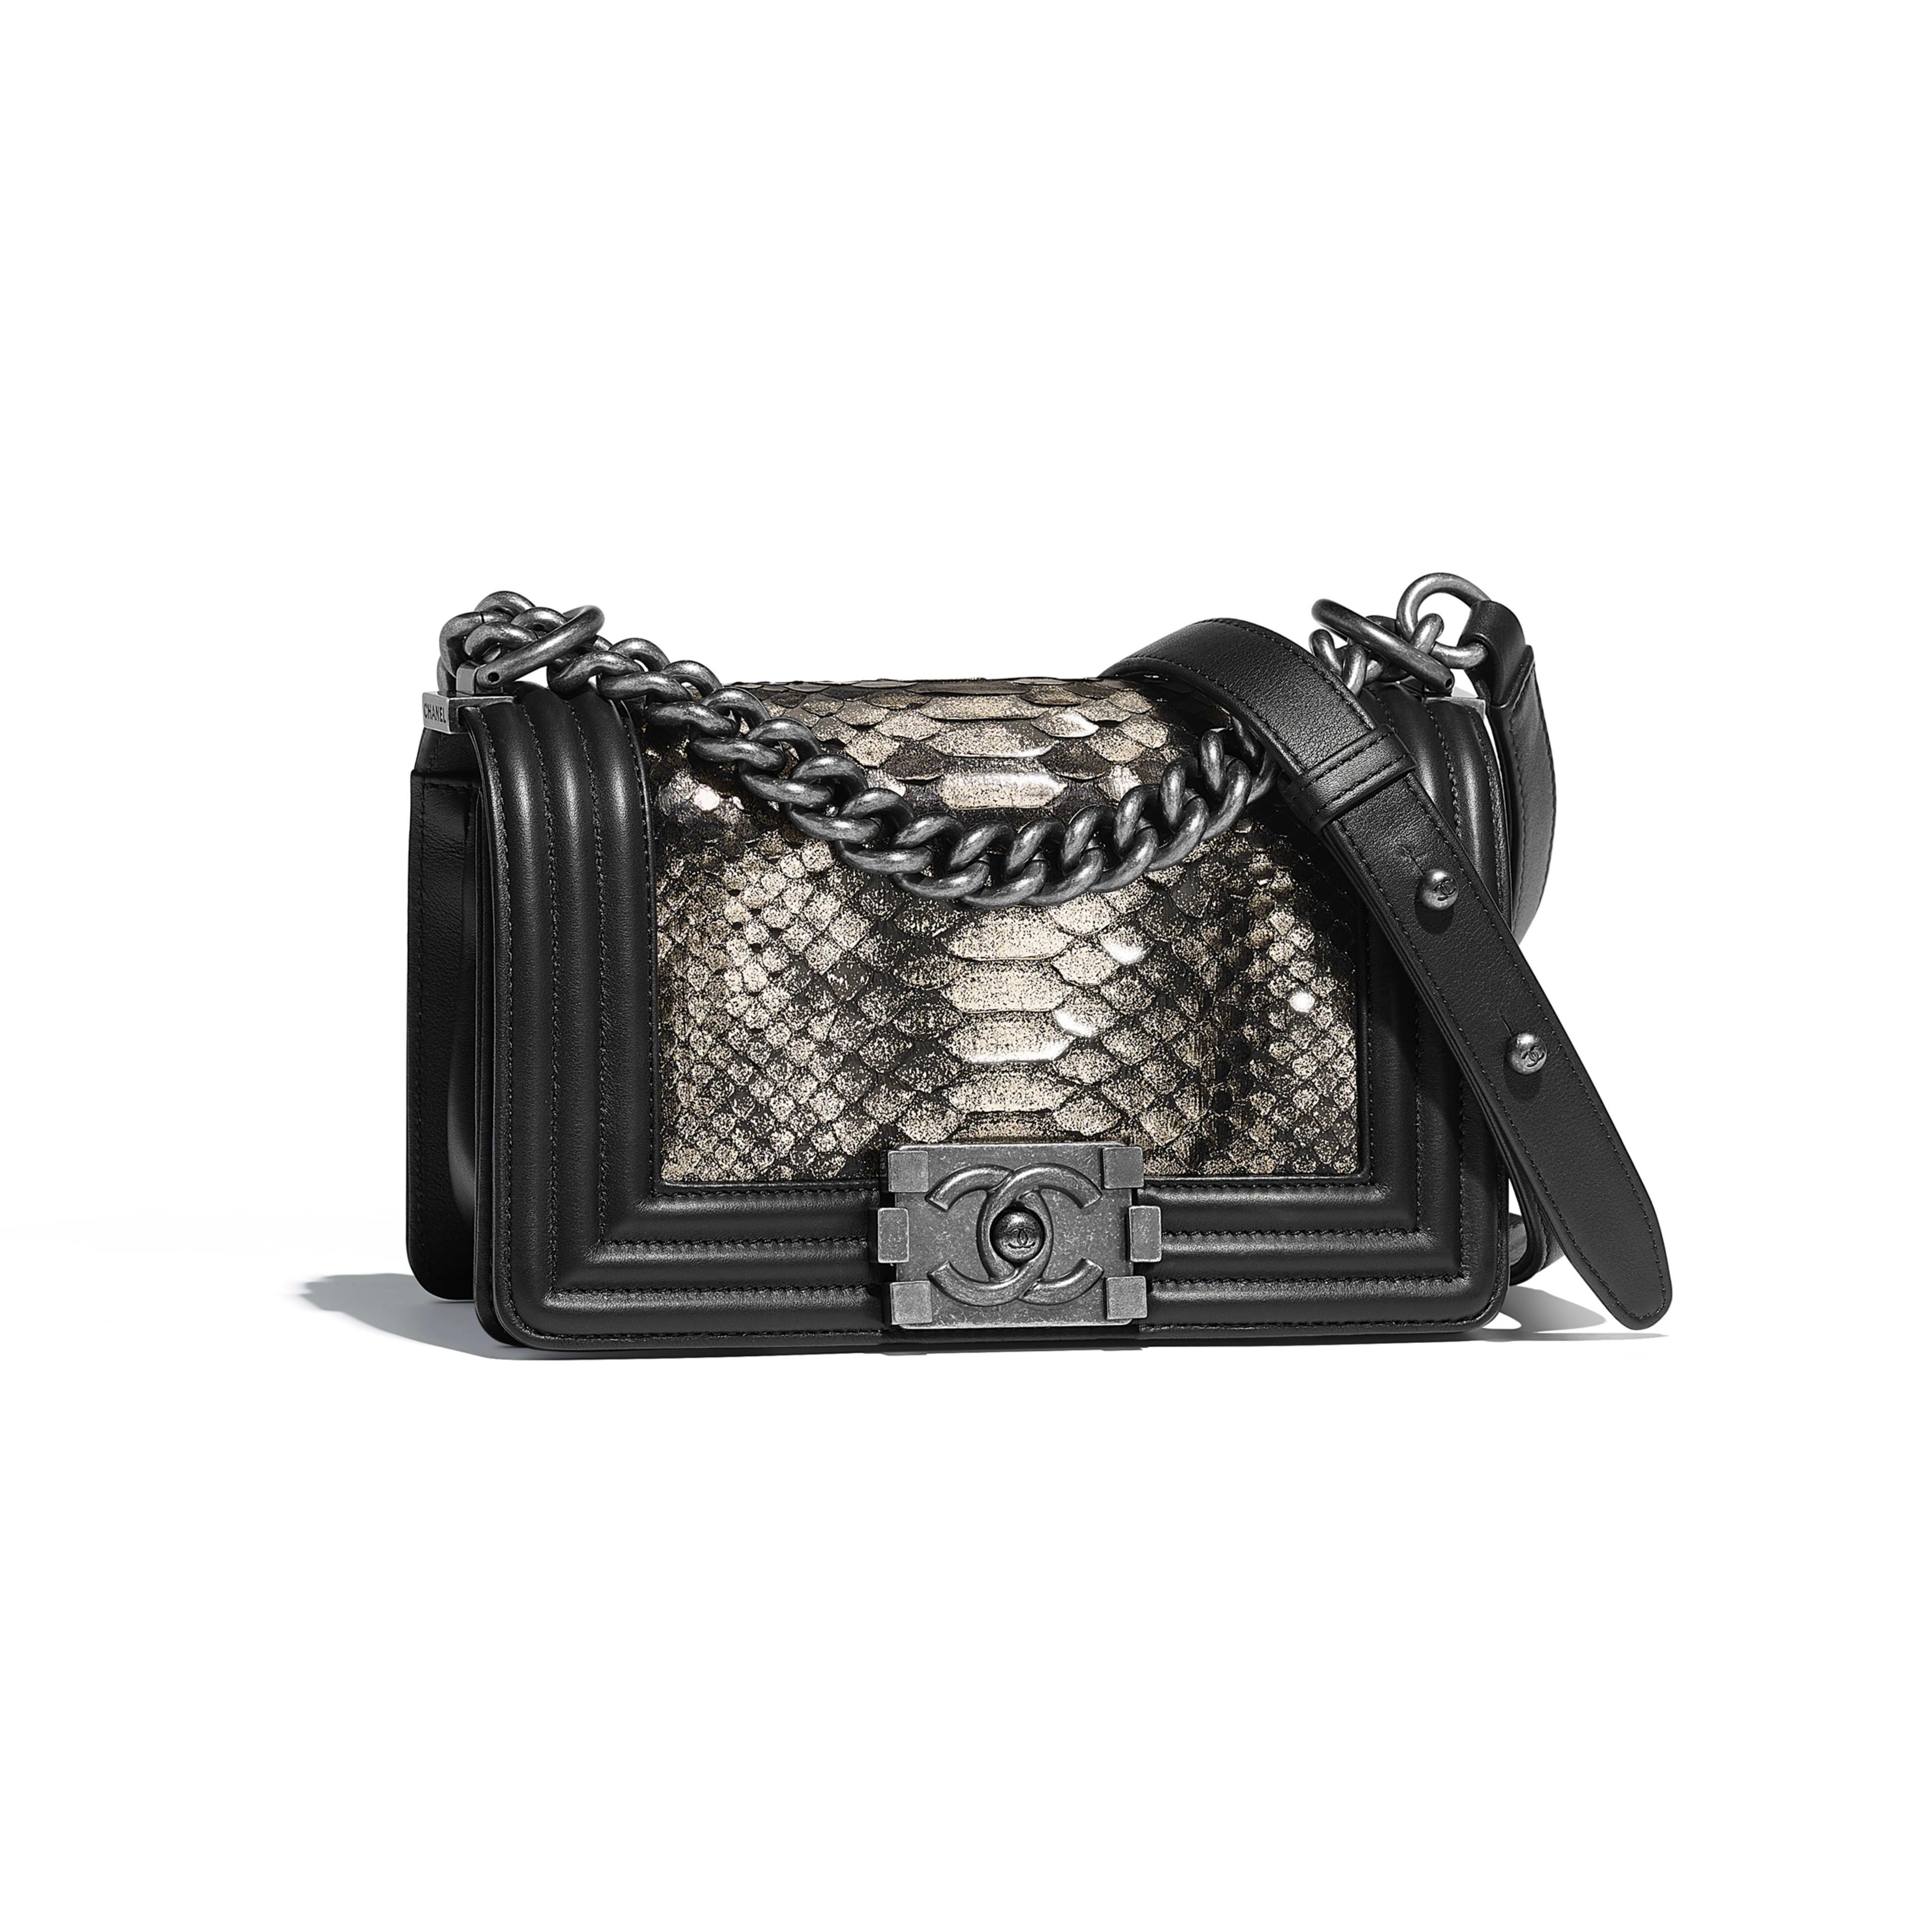 Small BOY CHANEL Handbag - Silver & Black - python, calfskin & ruthenium-finish metal - Default view - see full sized version